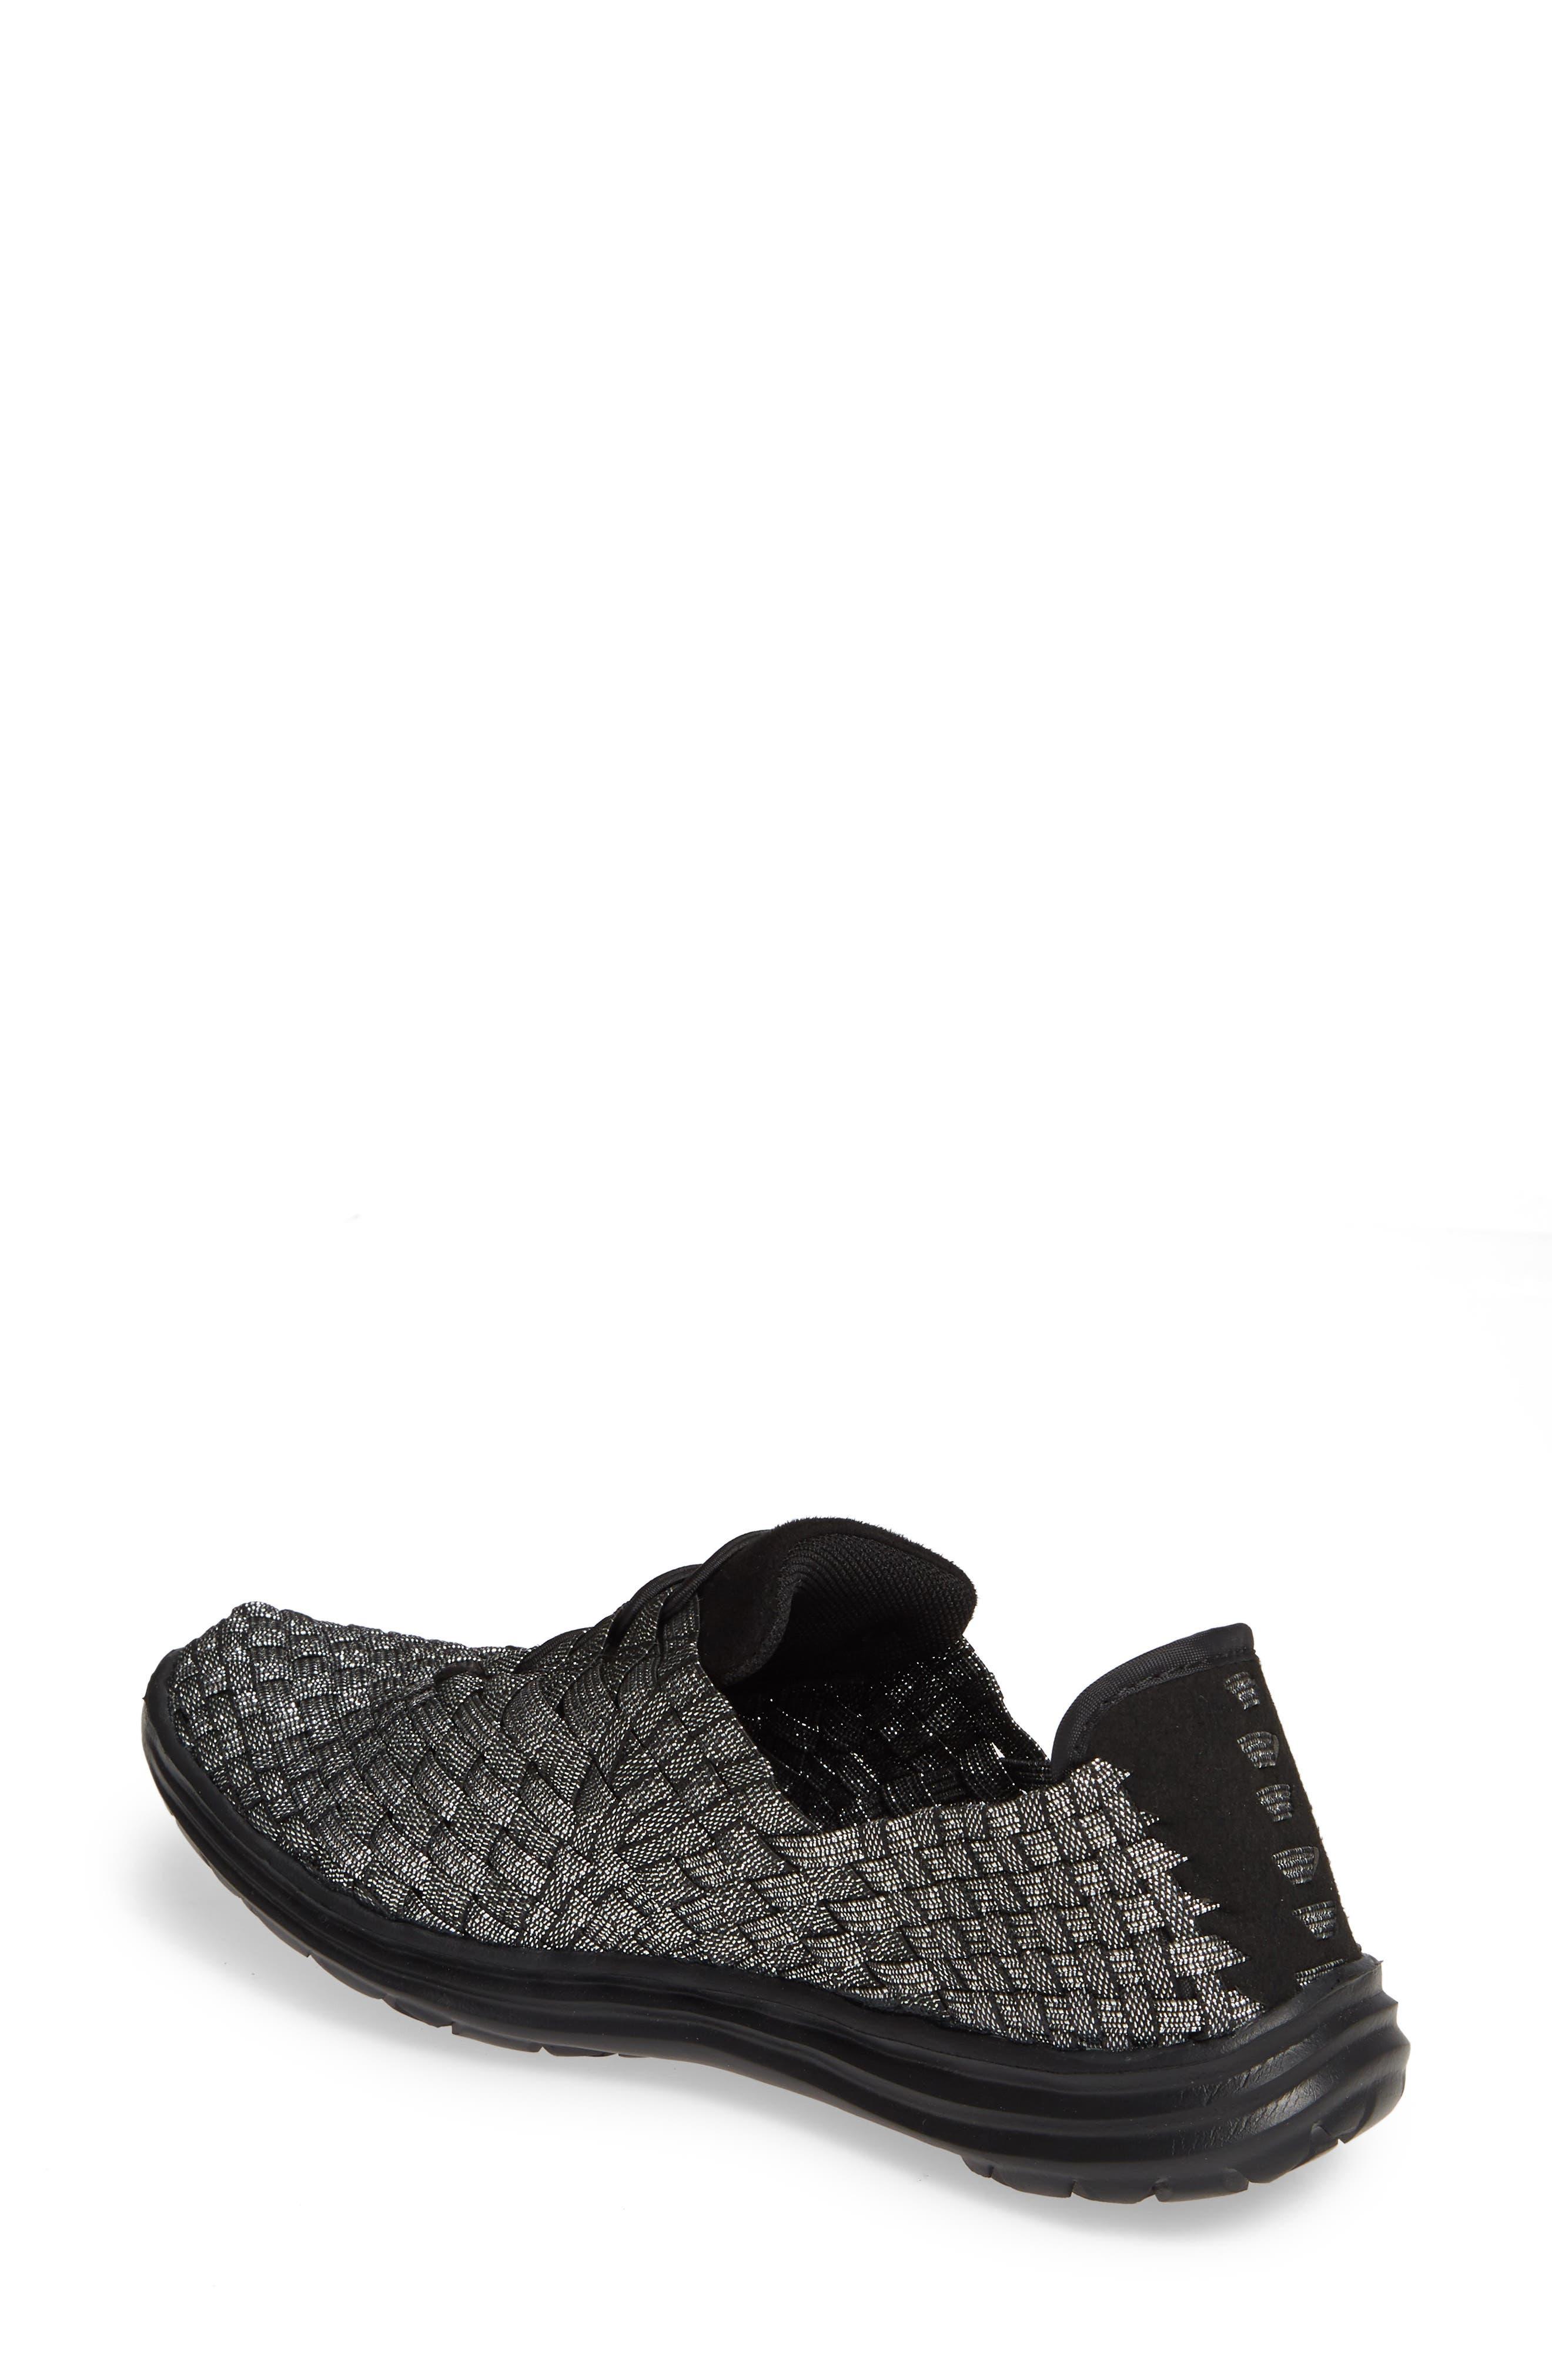 1d5f719616 Women s Bernie Mev. Sneakers   Running Shoes